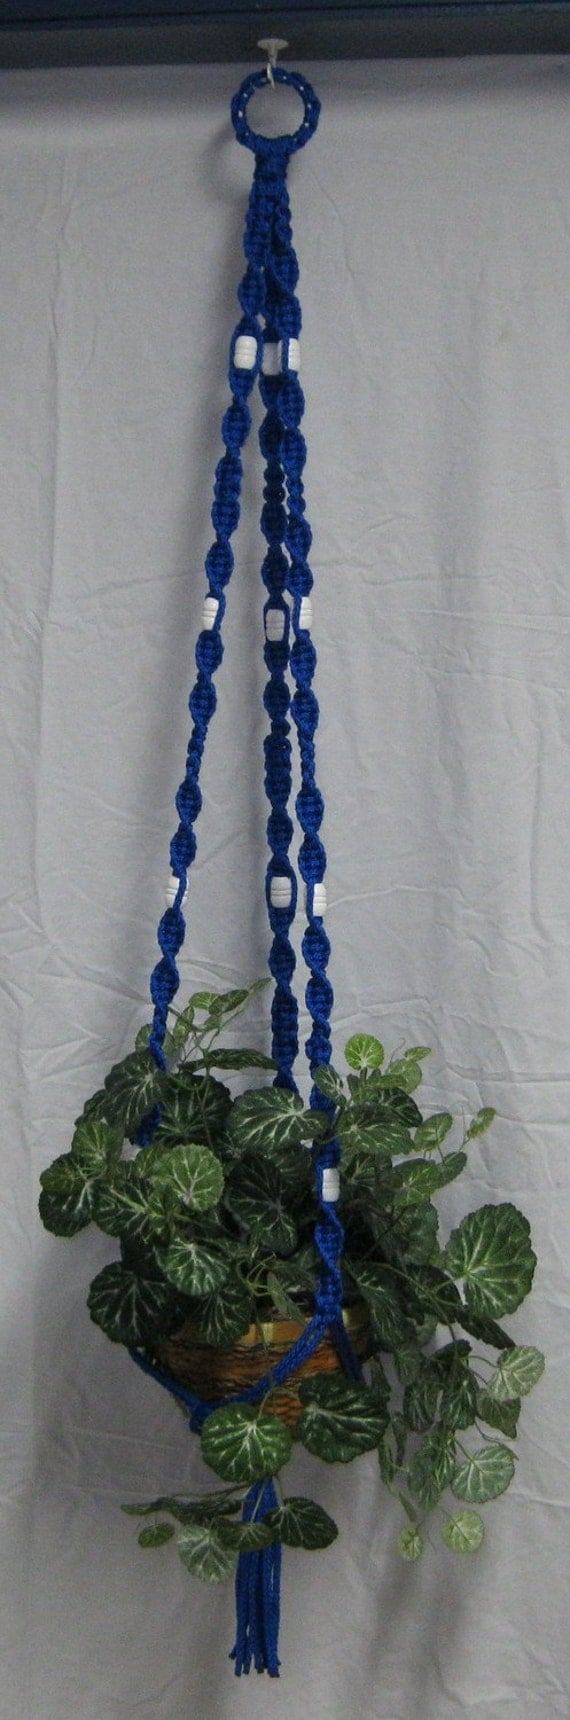 Royal Blue Macrame Plant Hanger